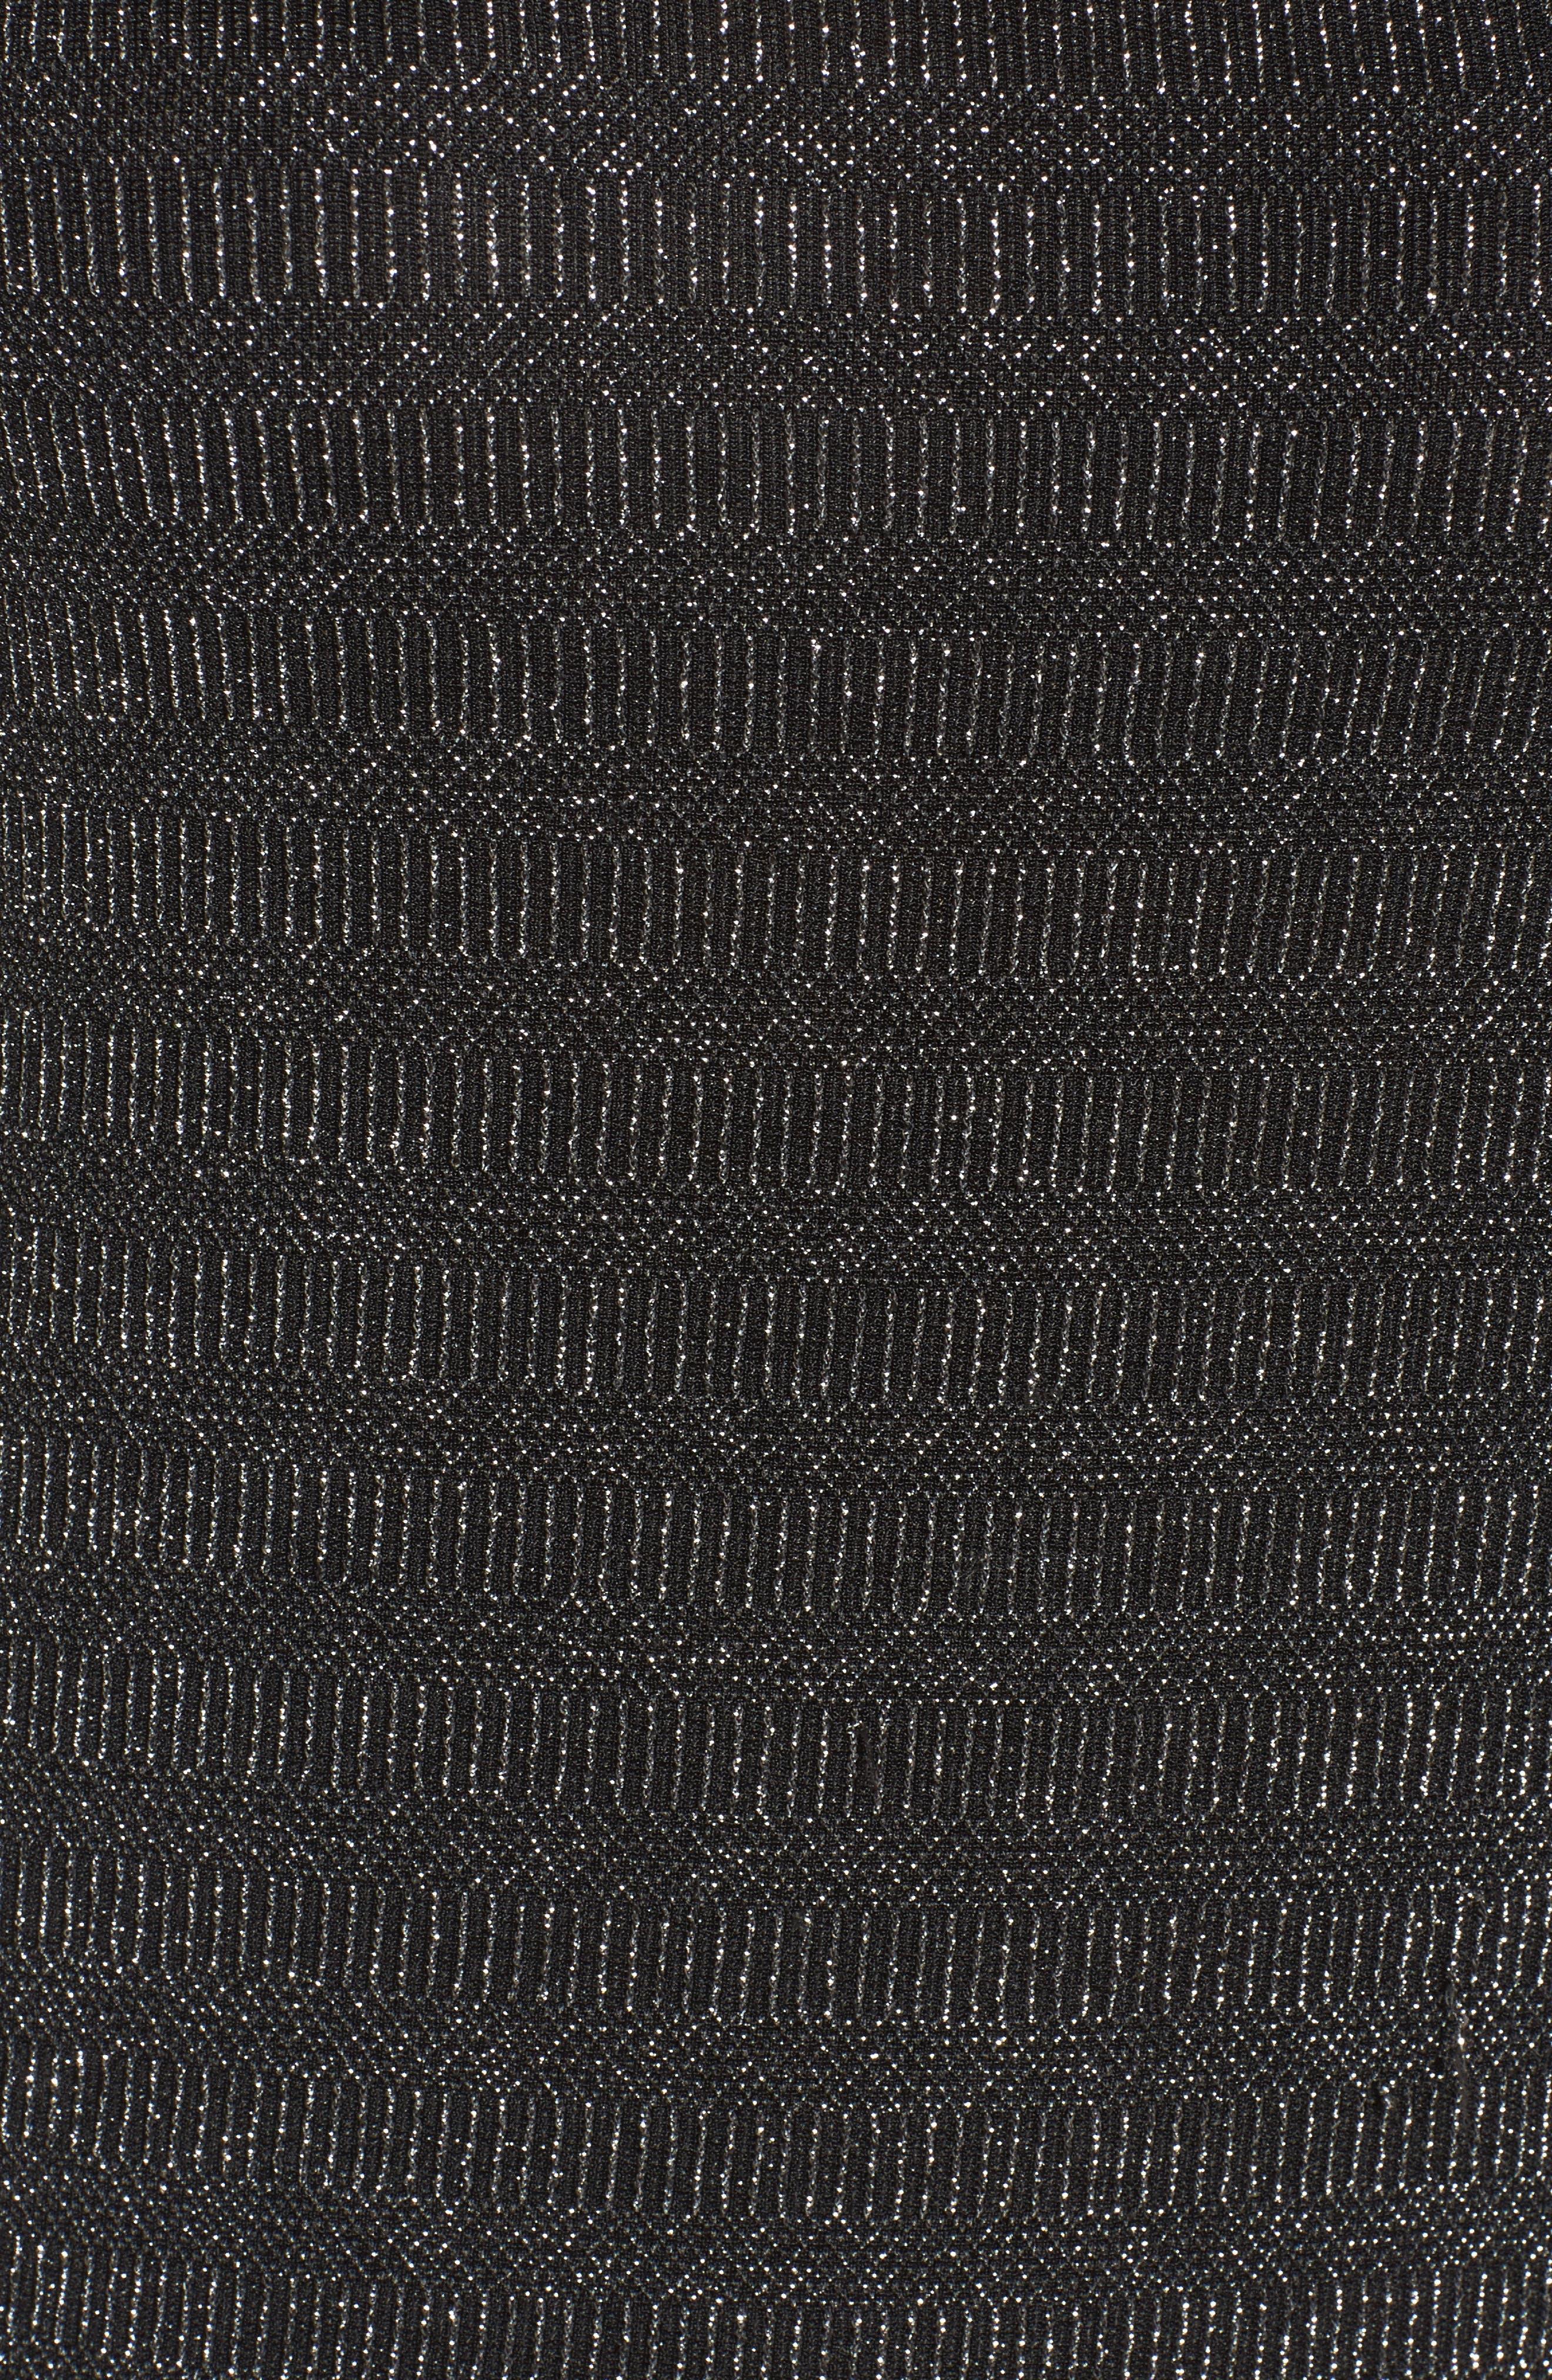 Glitter Bell Sleeve Top,                             Alternate thumbnail 5, color,                             041